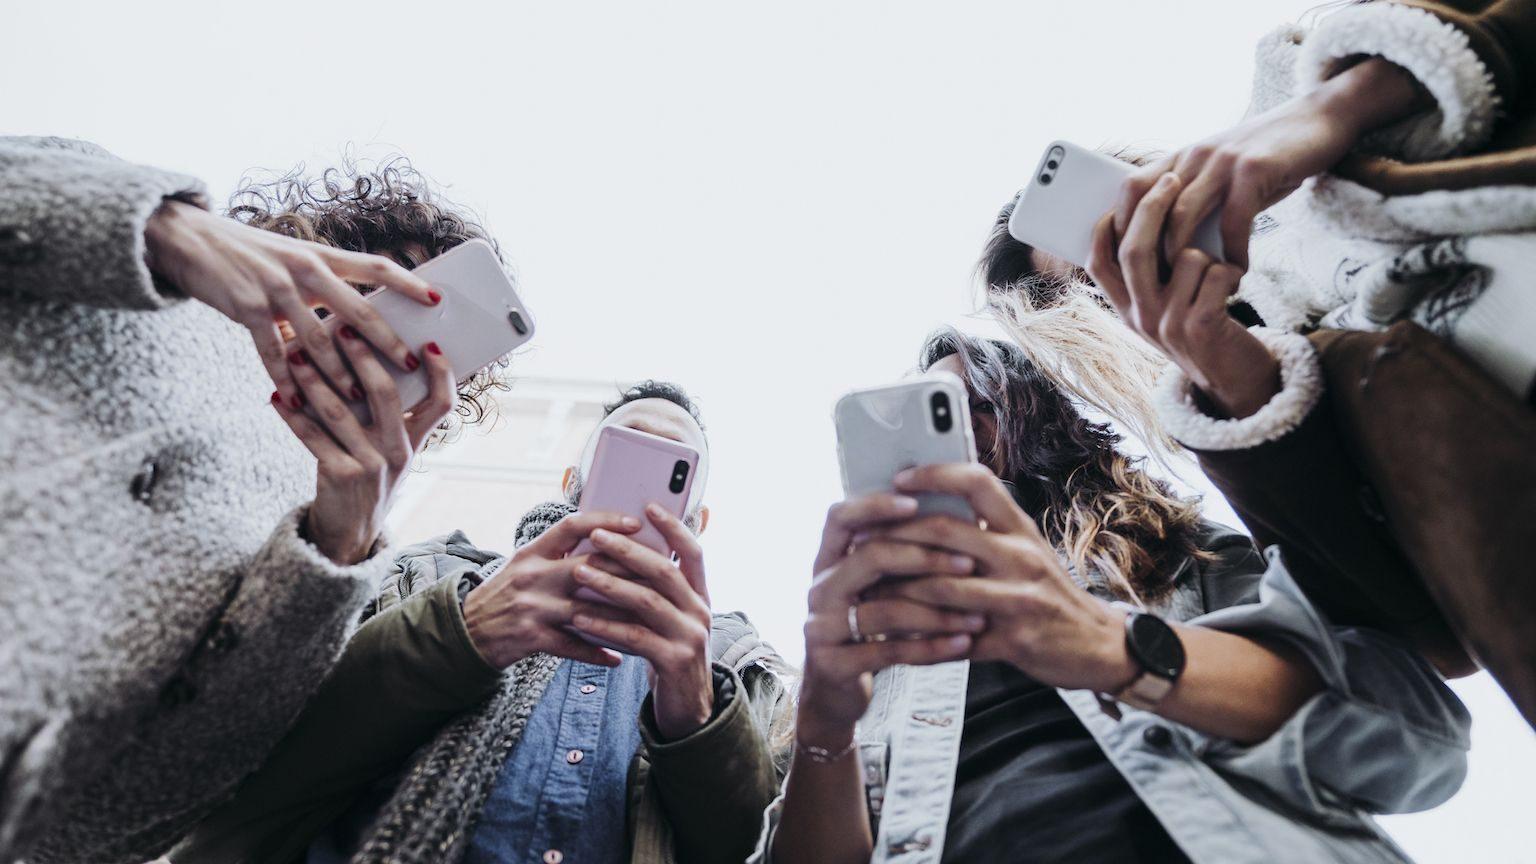 Mobile phones comparison